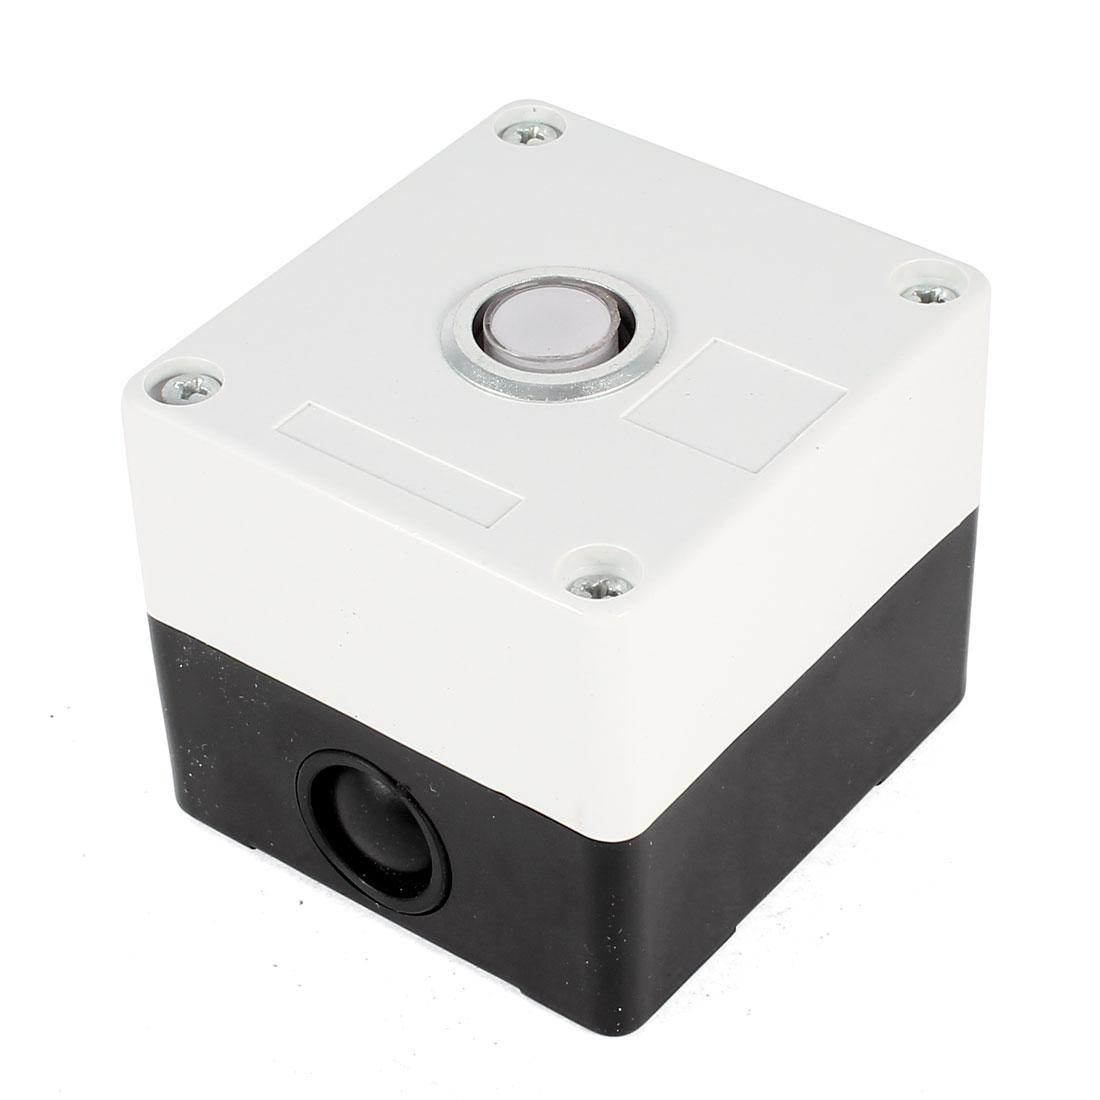 DC 24V 78mm x 72mm x 64mm Plastic Warm White Signal Indicator Light Lamp Bulb Box Black White